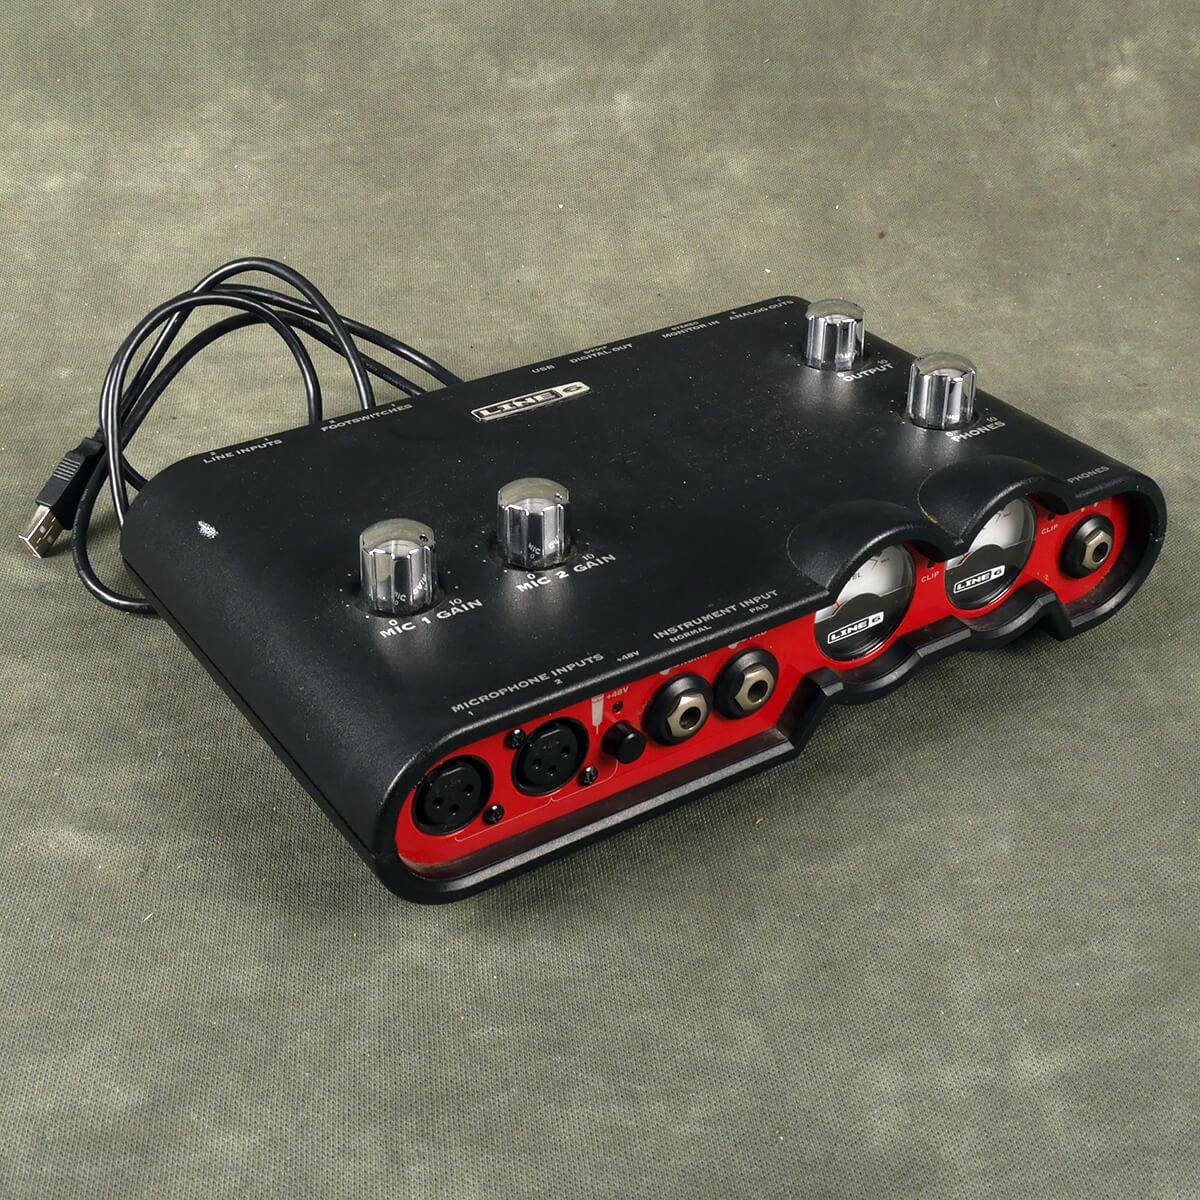 Line 6 Tone Port VX2 Audio Interface - 2nd Hand